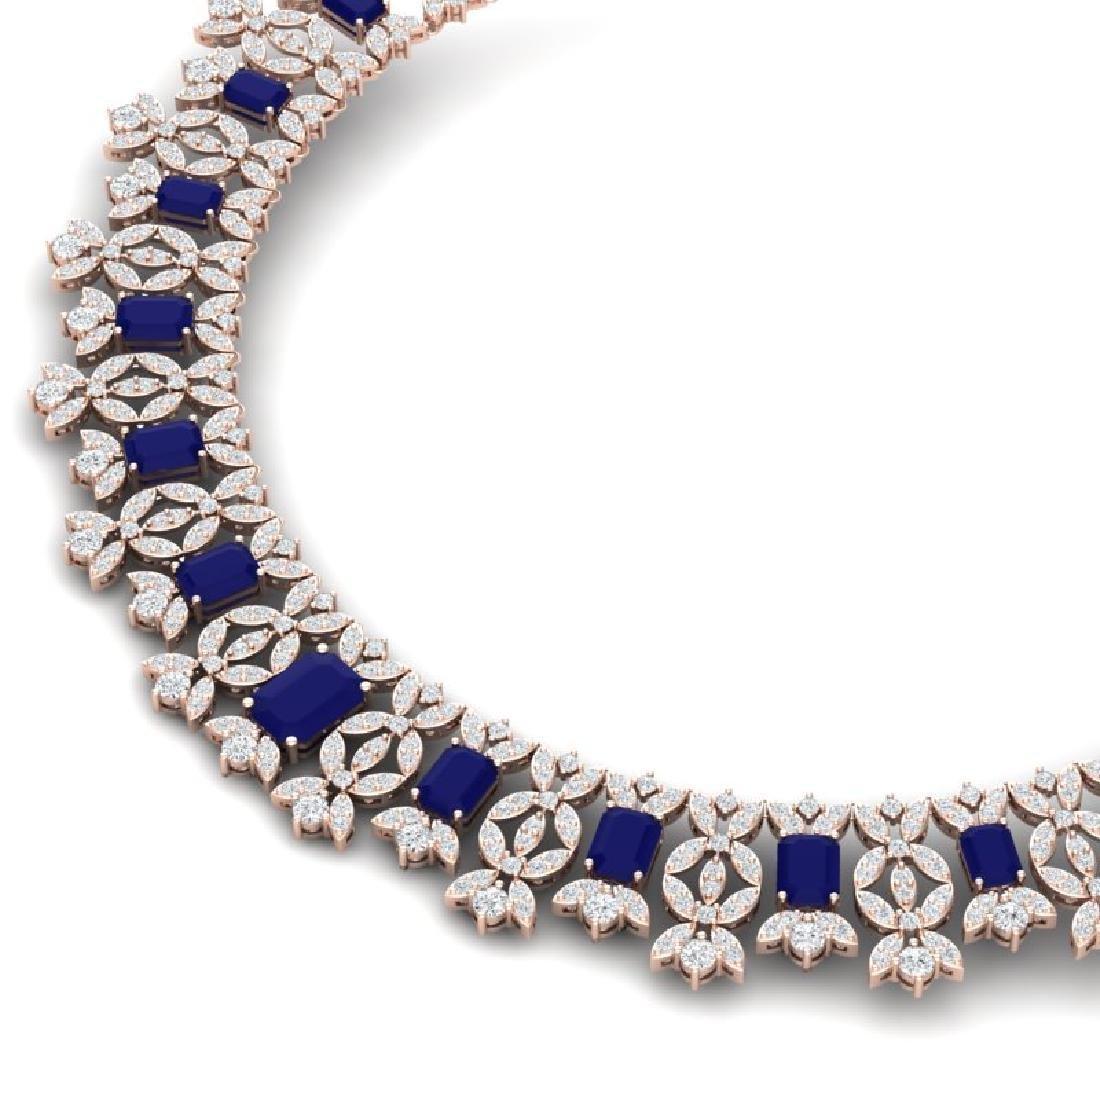 50.44 CTW Royalty Sapphire & VS Diamond Necklace 18K - 2